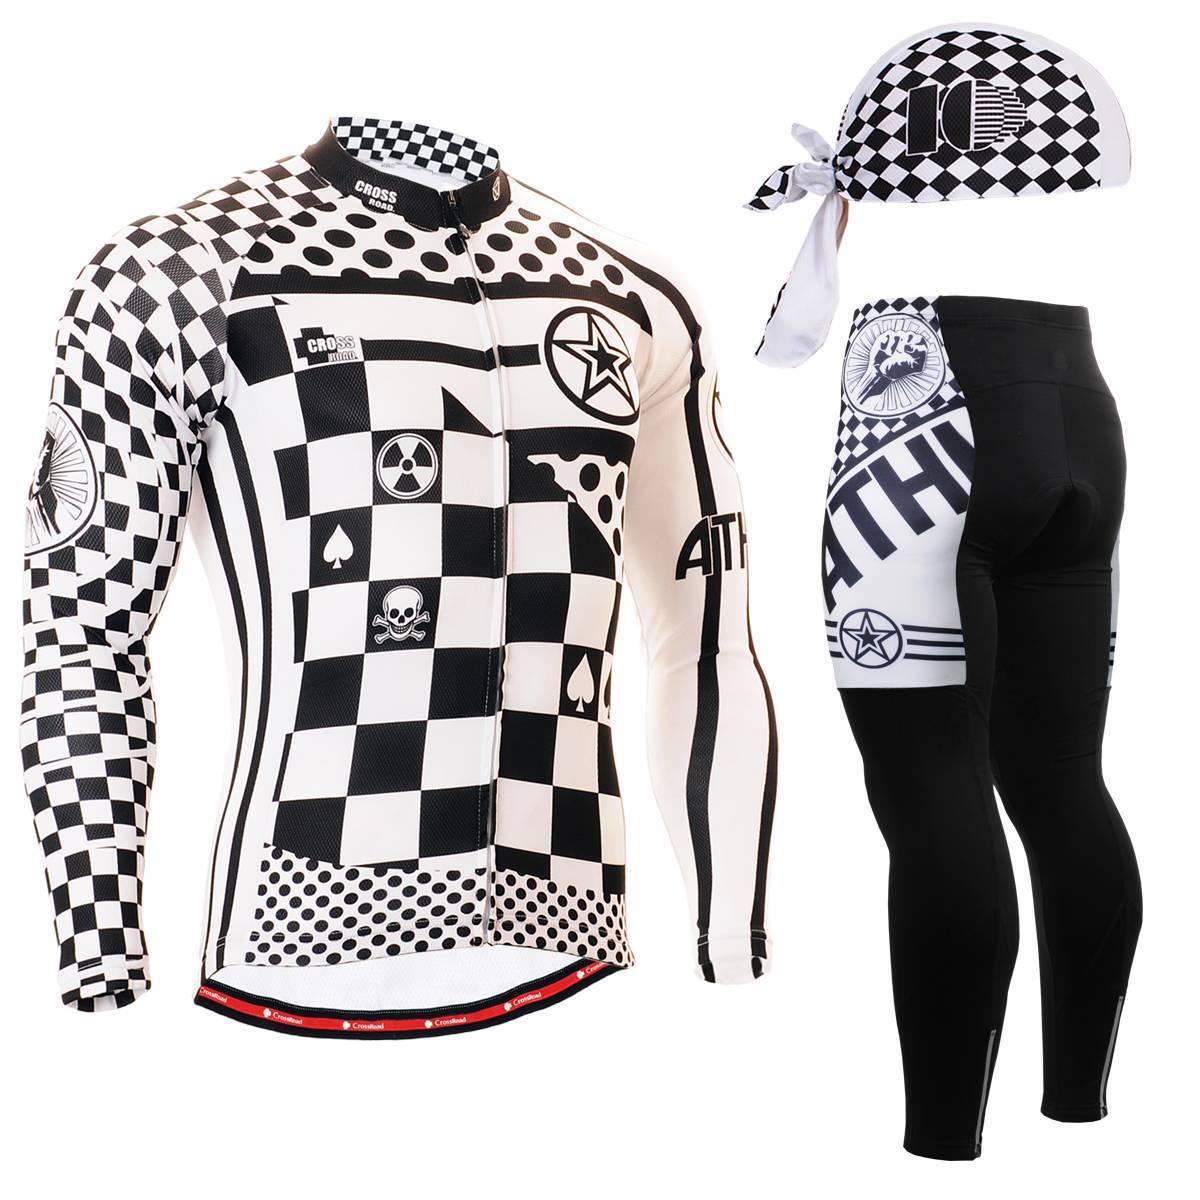 FIXGEAR & CS-601 SET Cycling Jersey & Padded Pants & FIXGEAR Bandana Rodebike MTB c7108b